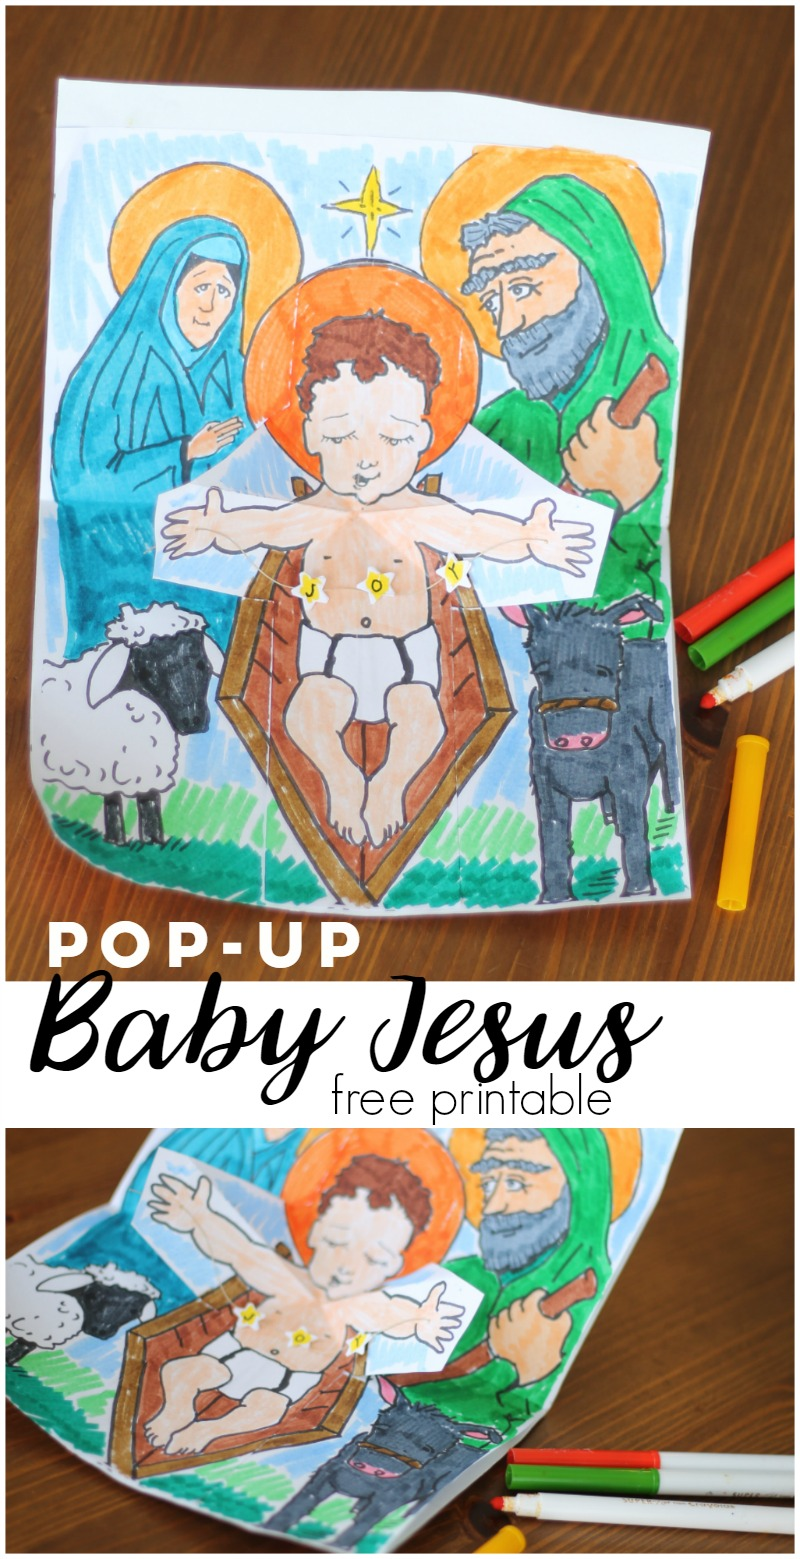 PopUp Baby Jesus Printable Activity